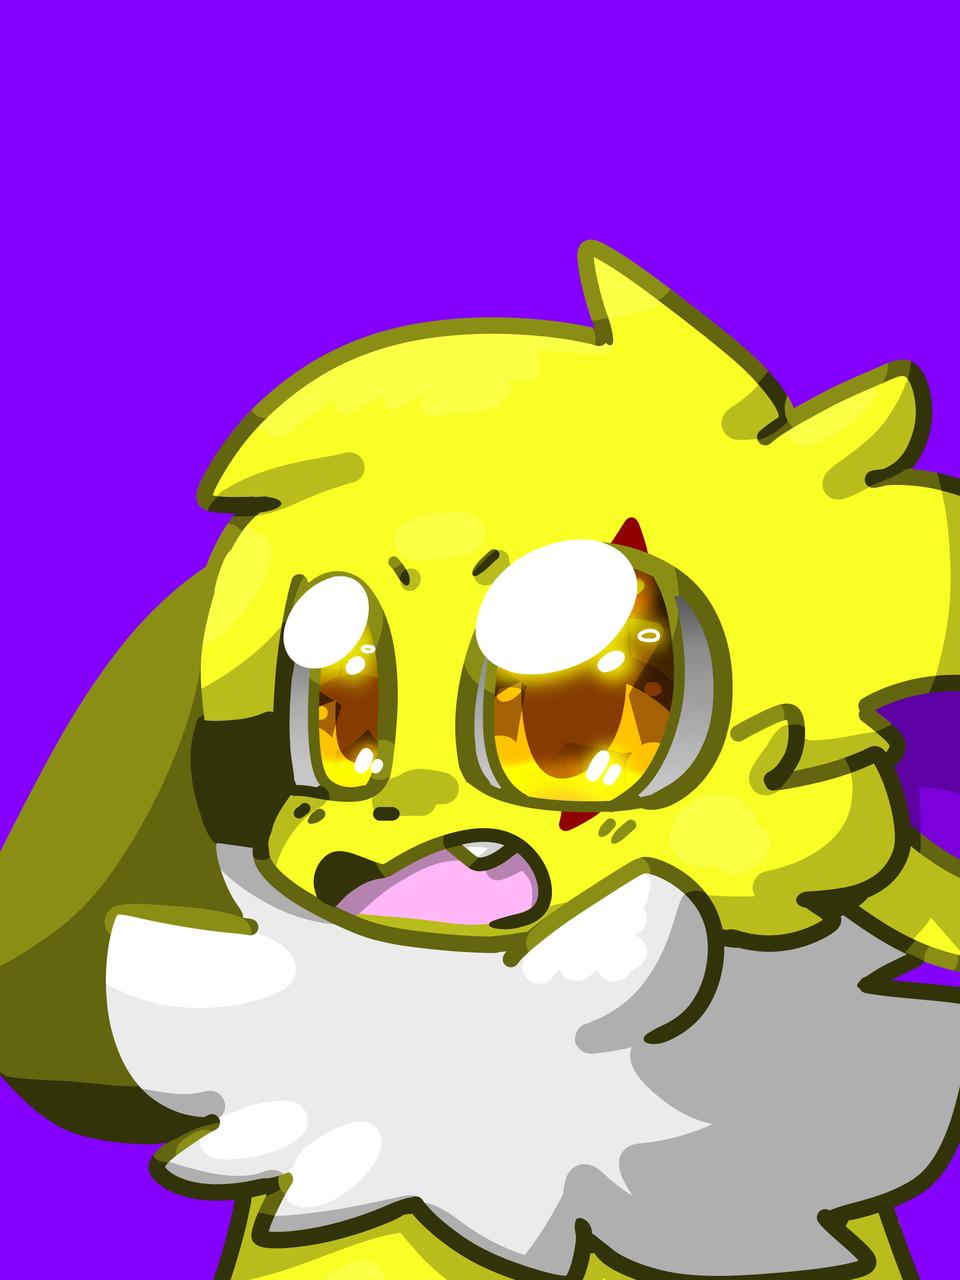 Happy Joltee (Redraw) Illust of ✨ PKN-133 ✨ digital cute Jolteon furry oc medibangpaint PKN-133 redraw pokemon